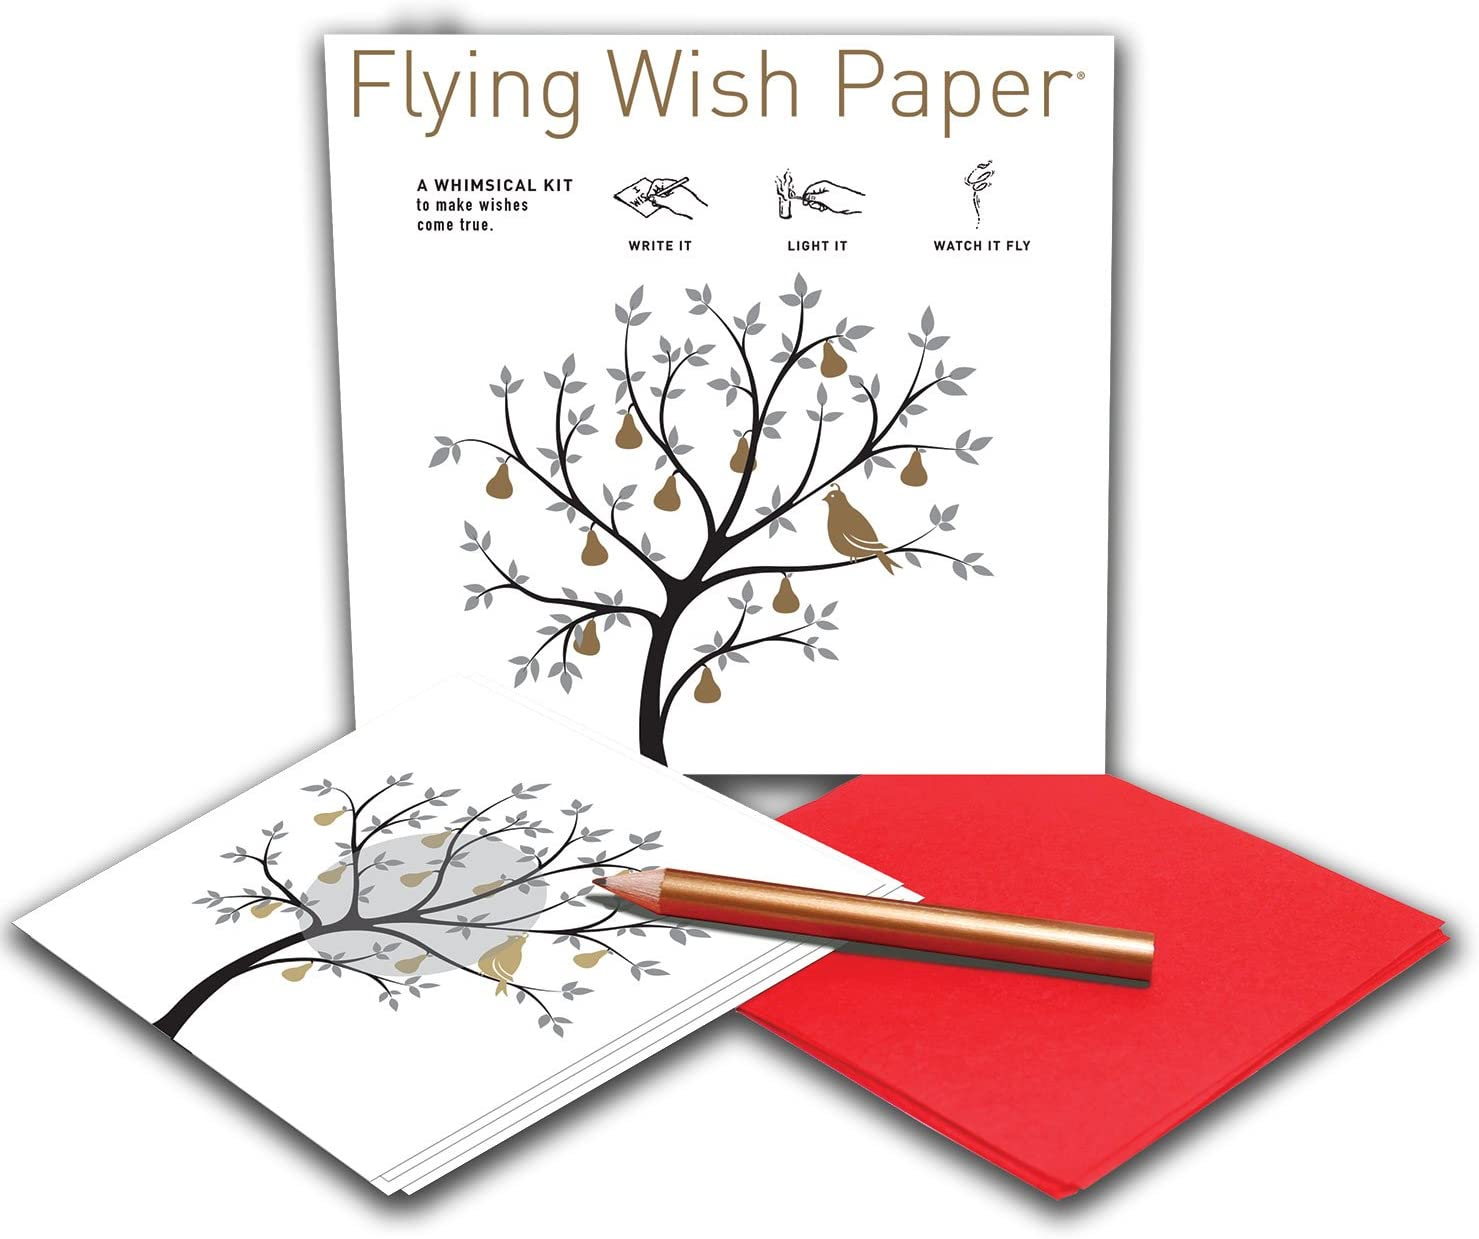 Mini Kits BIRDCAGE BALLERINA Flying Wish Paper I WISH I COULD FLY! 5 x 5